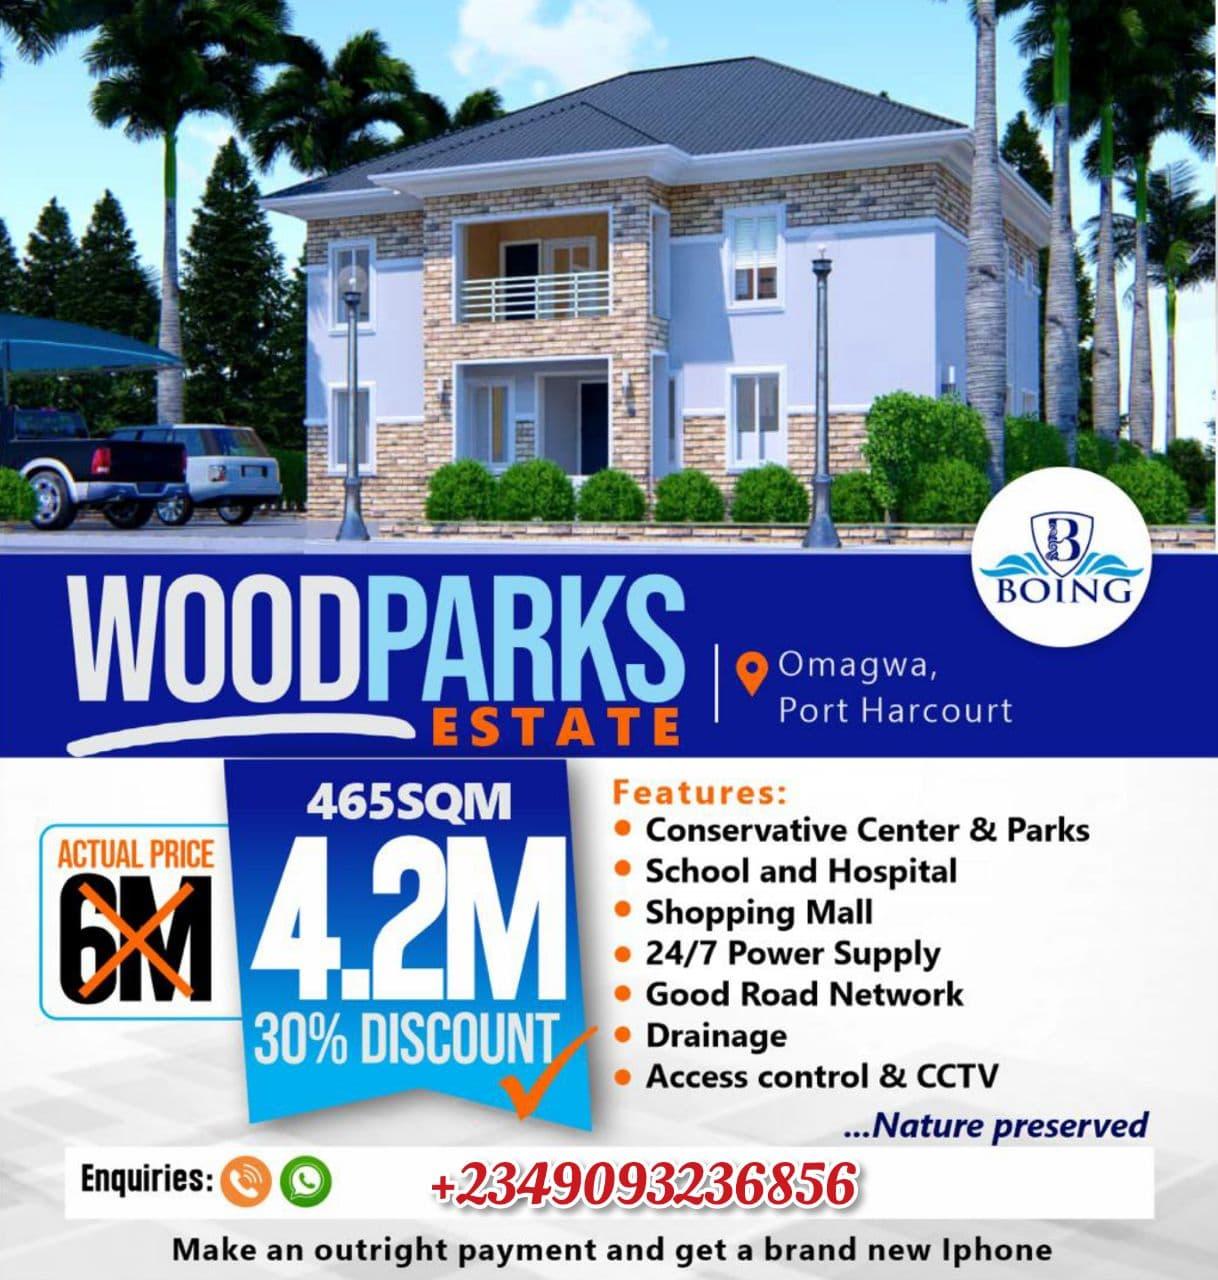 Land For Sale in Woodparks Estate, Omagwa, Port Harcourt